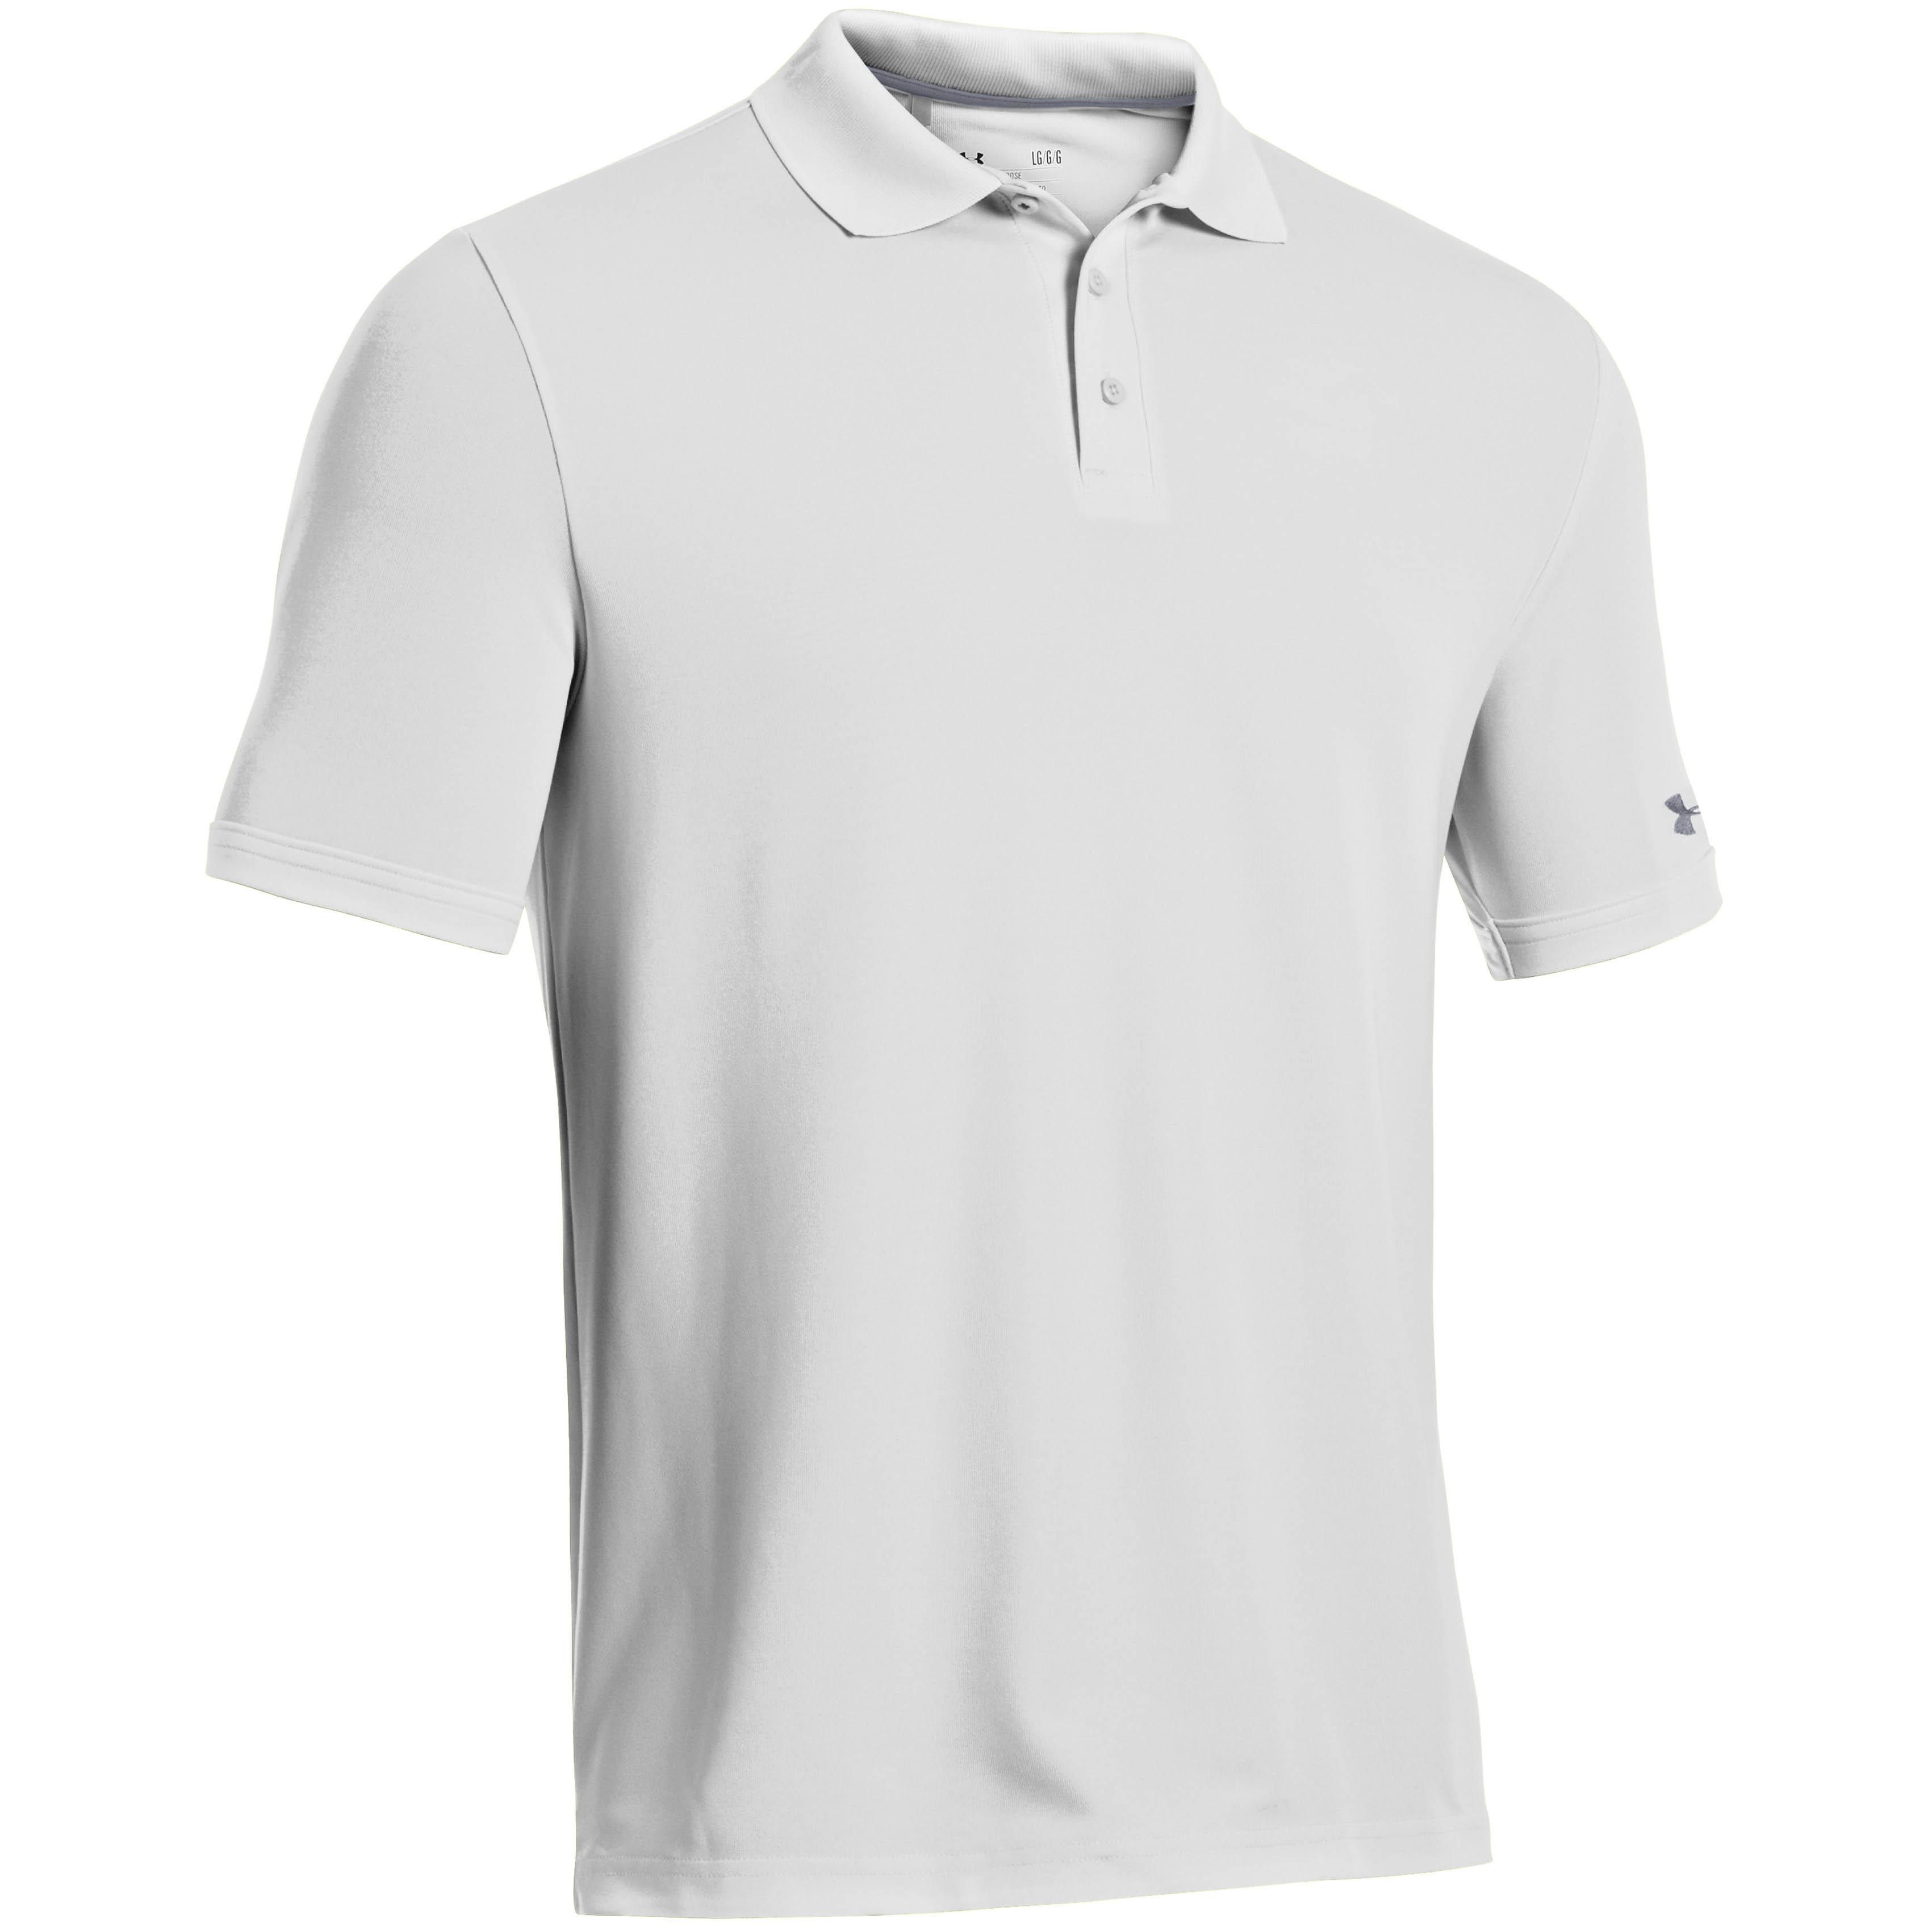 Under-Armour-Mens-Medal-Play-Performance-Polo-Shirt-UA-Golf-Short-Sleeve thumbnail 27